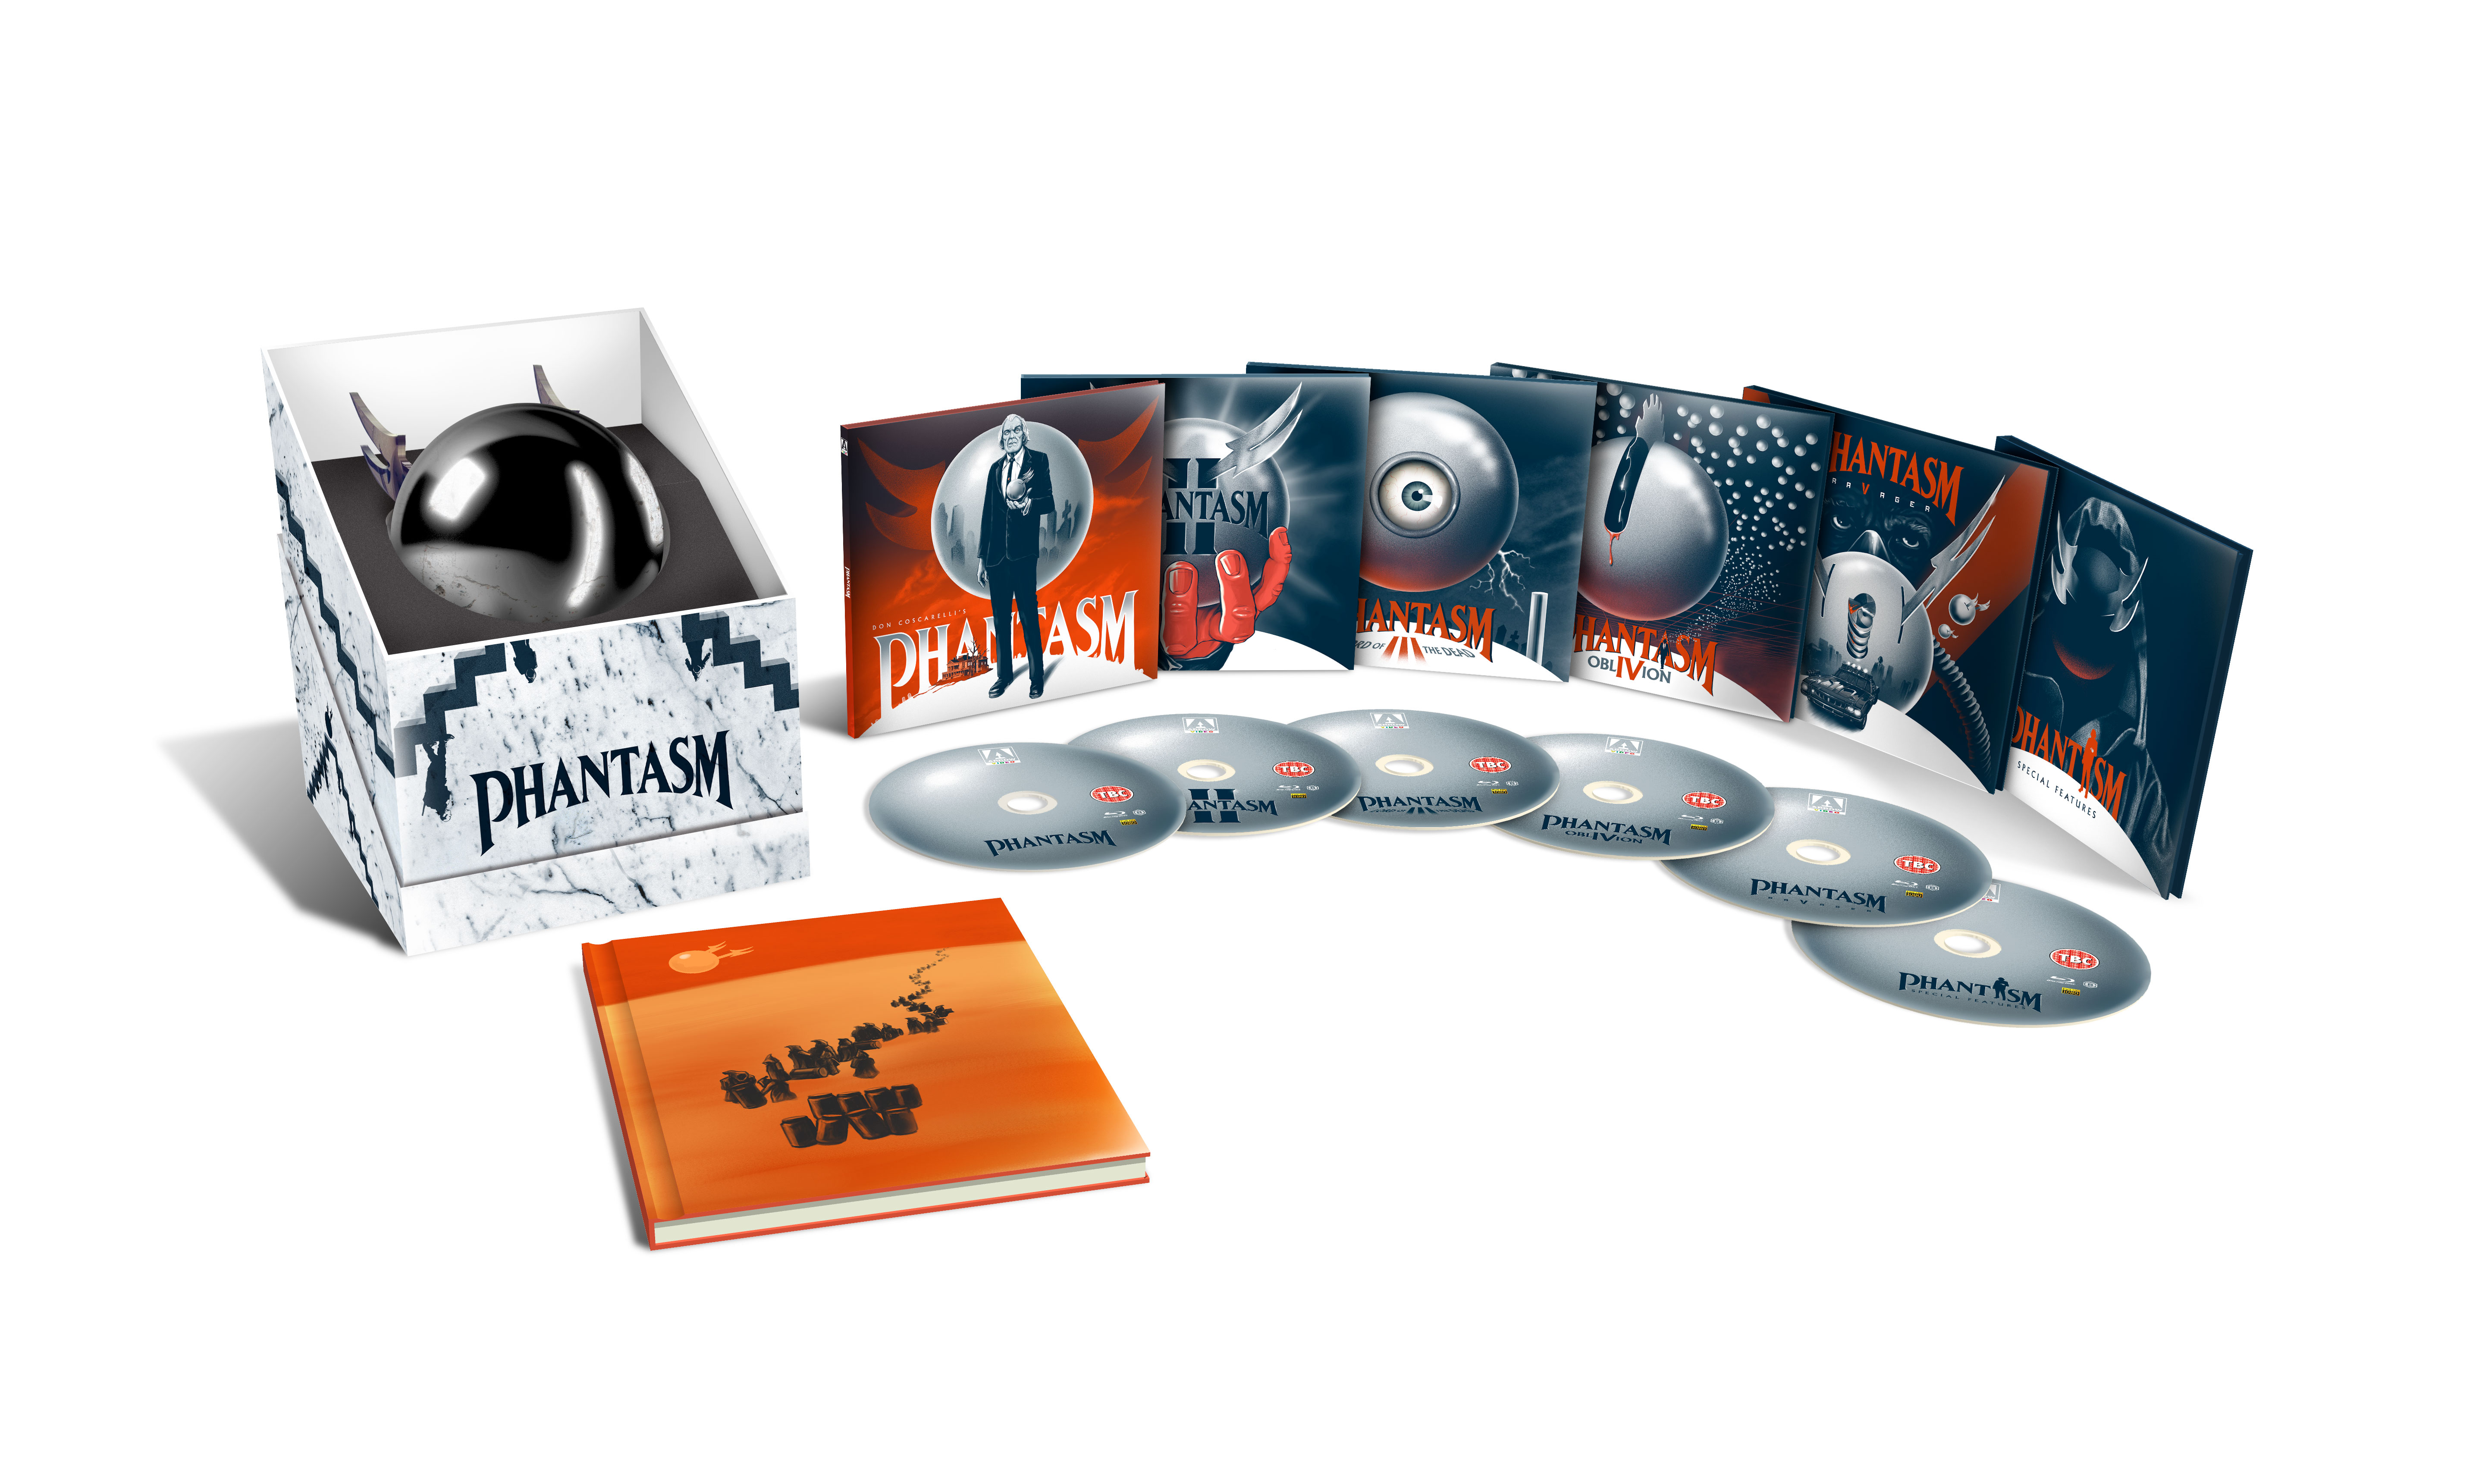 PHANTASM GIFT BOX VIS V1 Arrow Video announce April 2017 releases